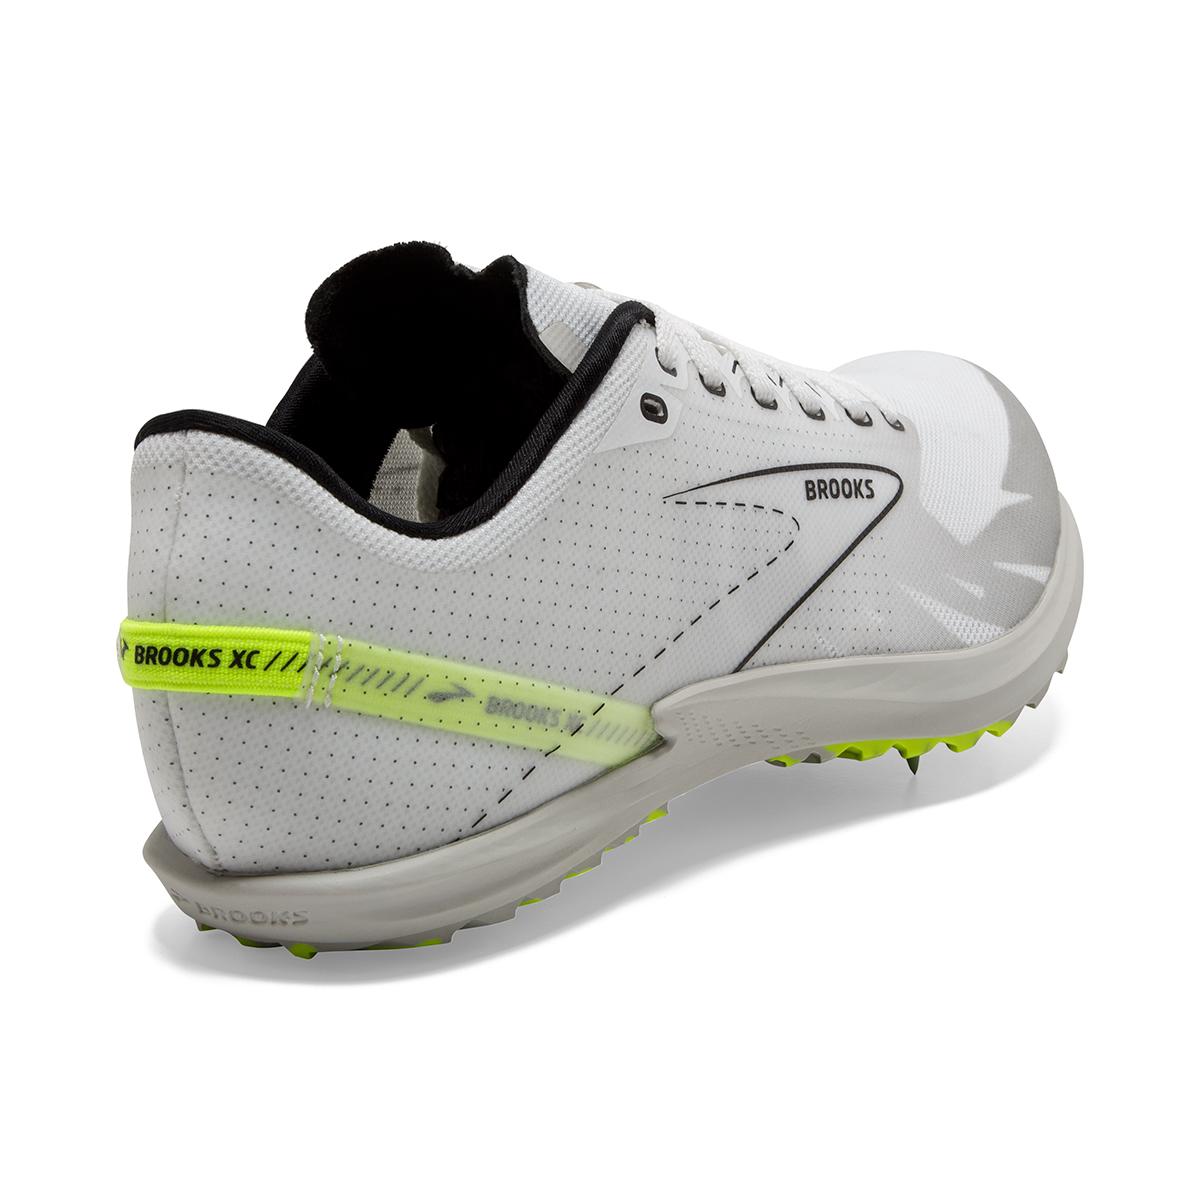 Brooks Launch XC - Color: White/Black/Nightlife - Size: M4/W5.5 - Width: Regular, White/Black/Nightlife, large, image 6